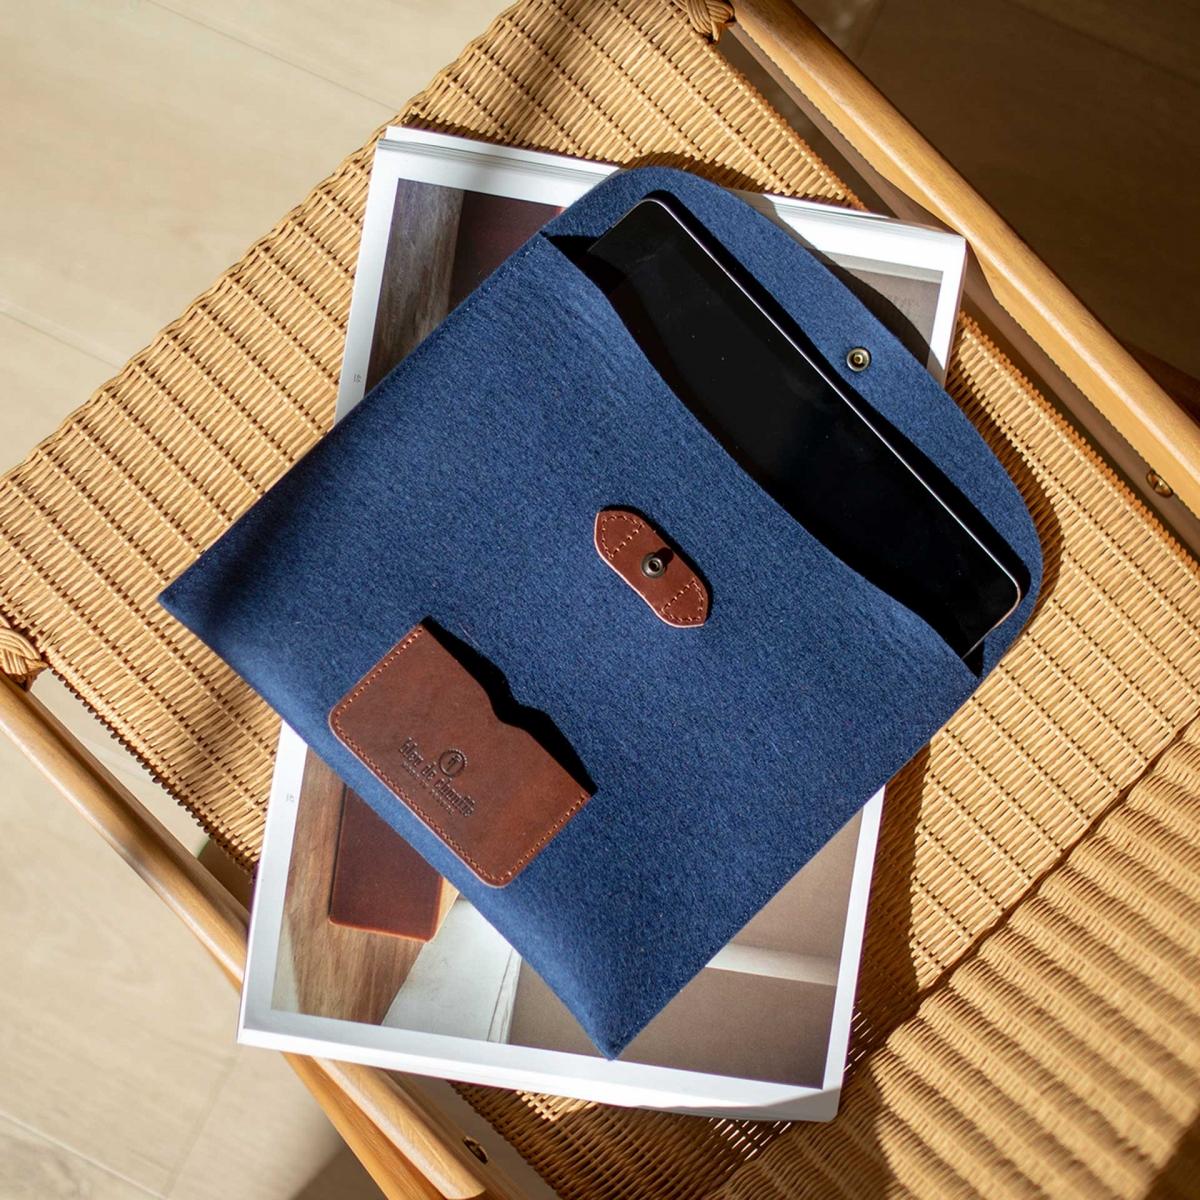 Protection iPad Miky - Feutre Marine (image n°5)